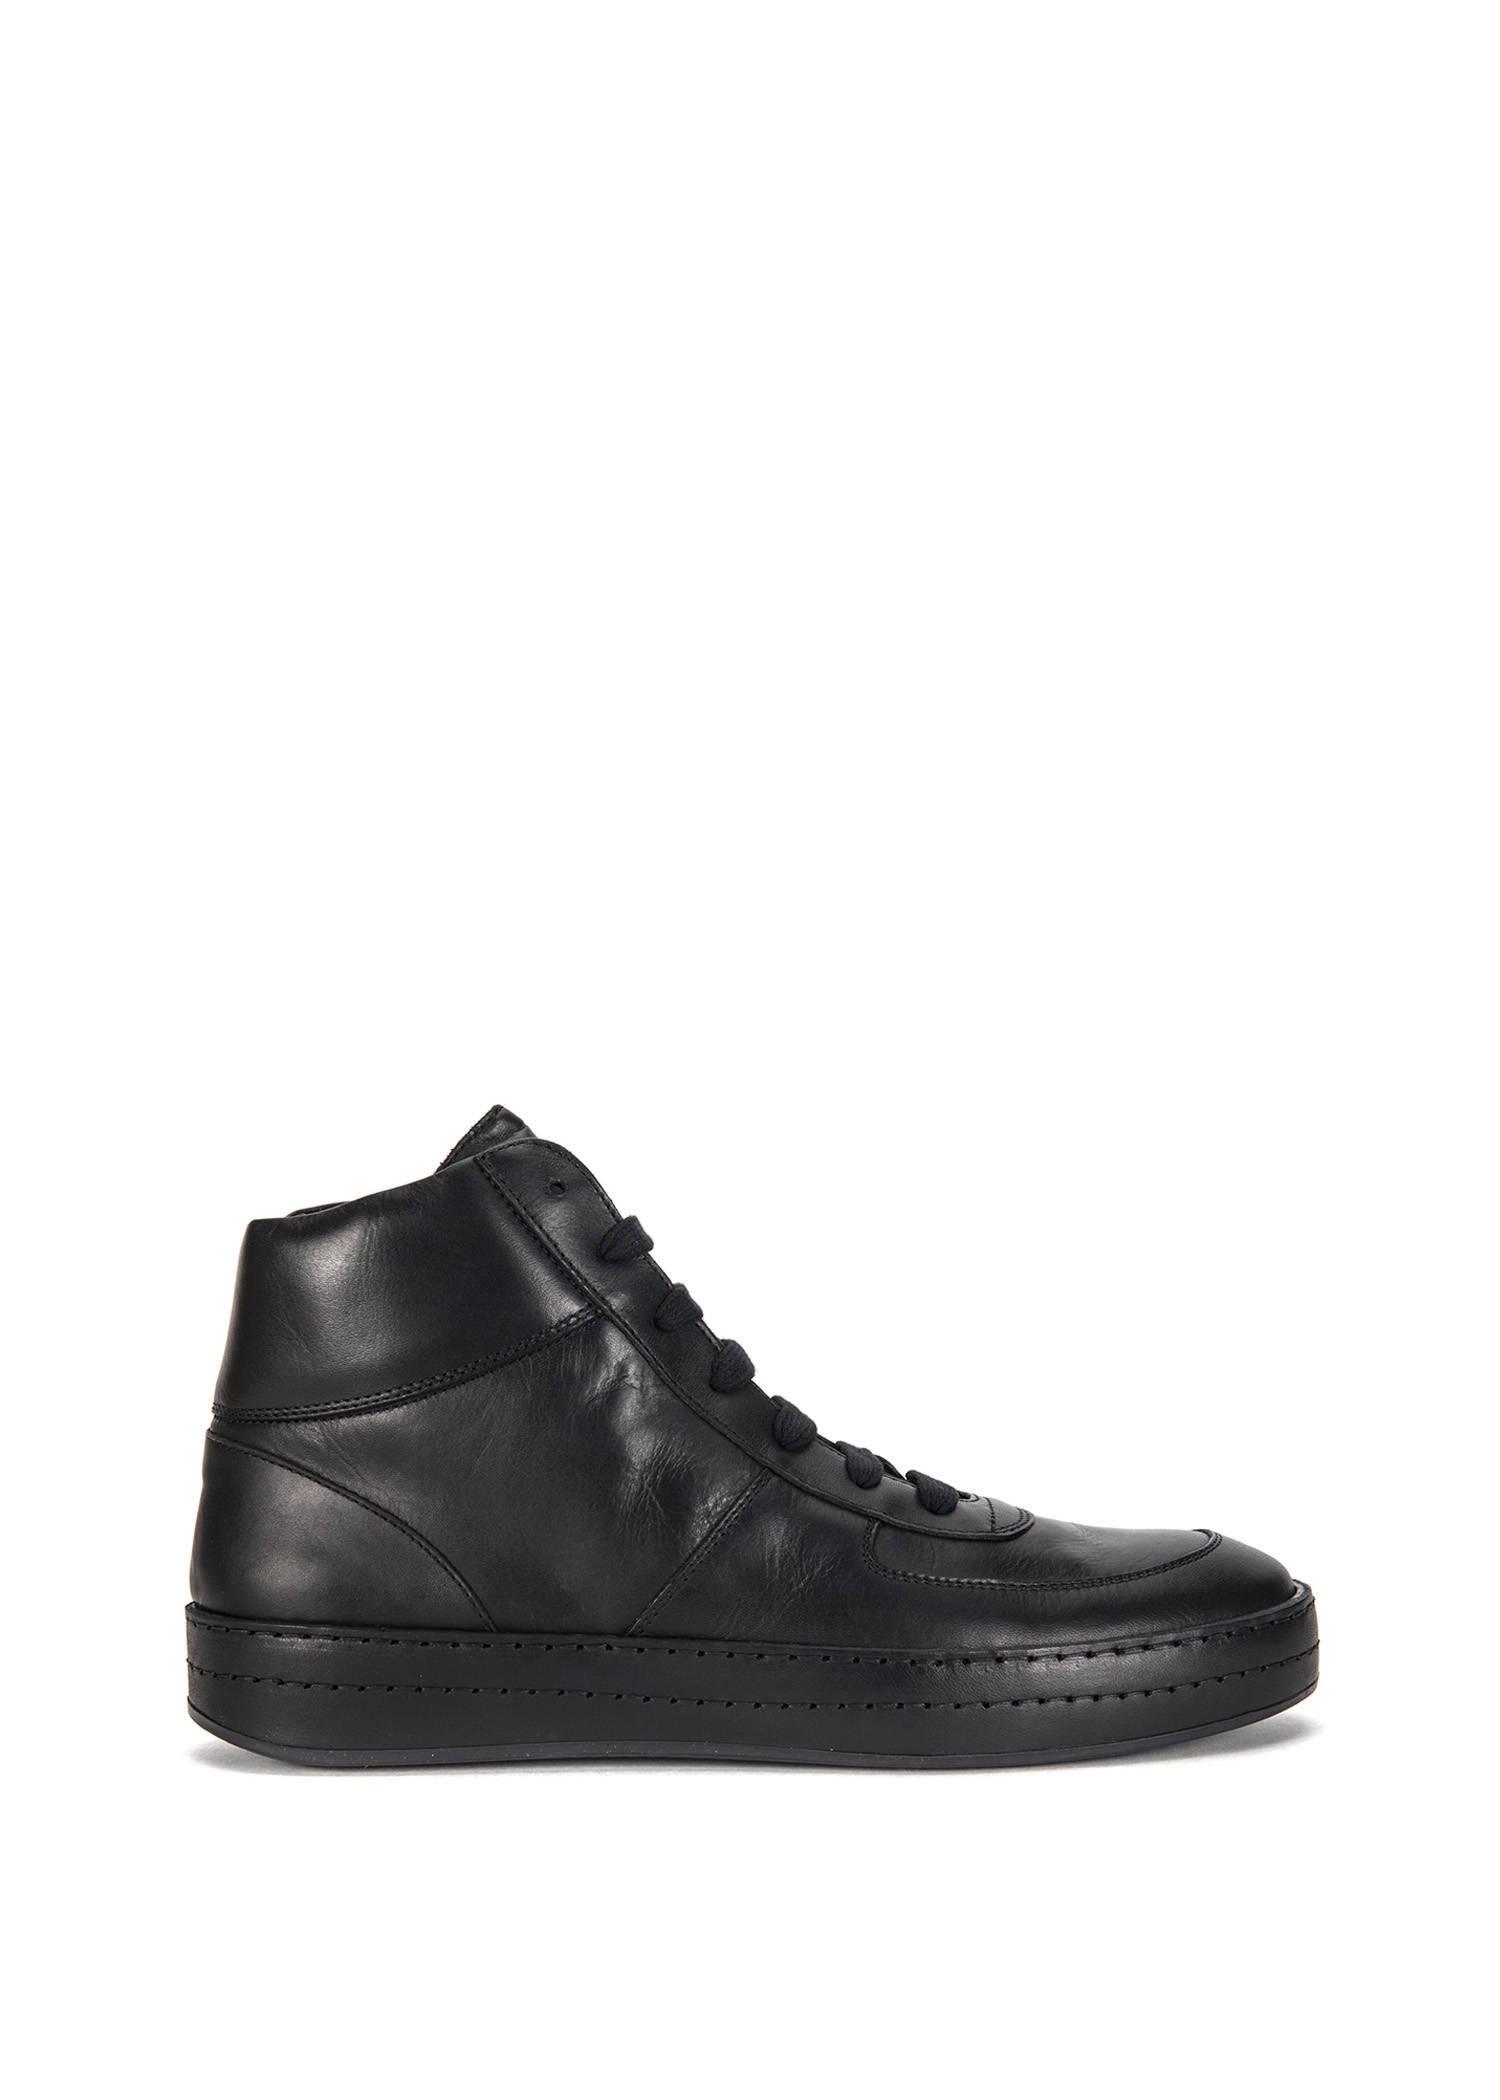 Ann Demeulemeester High Top Sneaker In Black